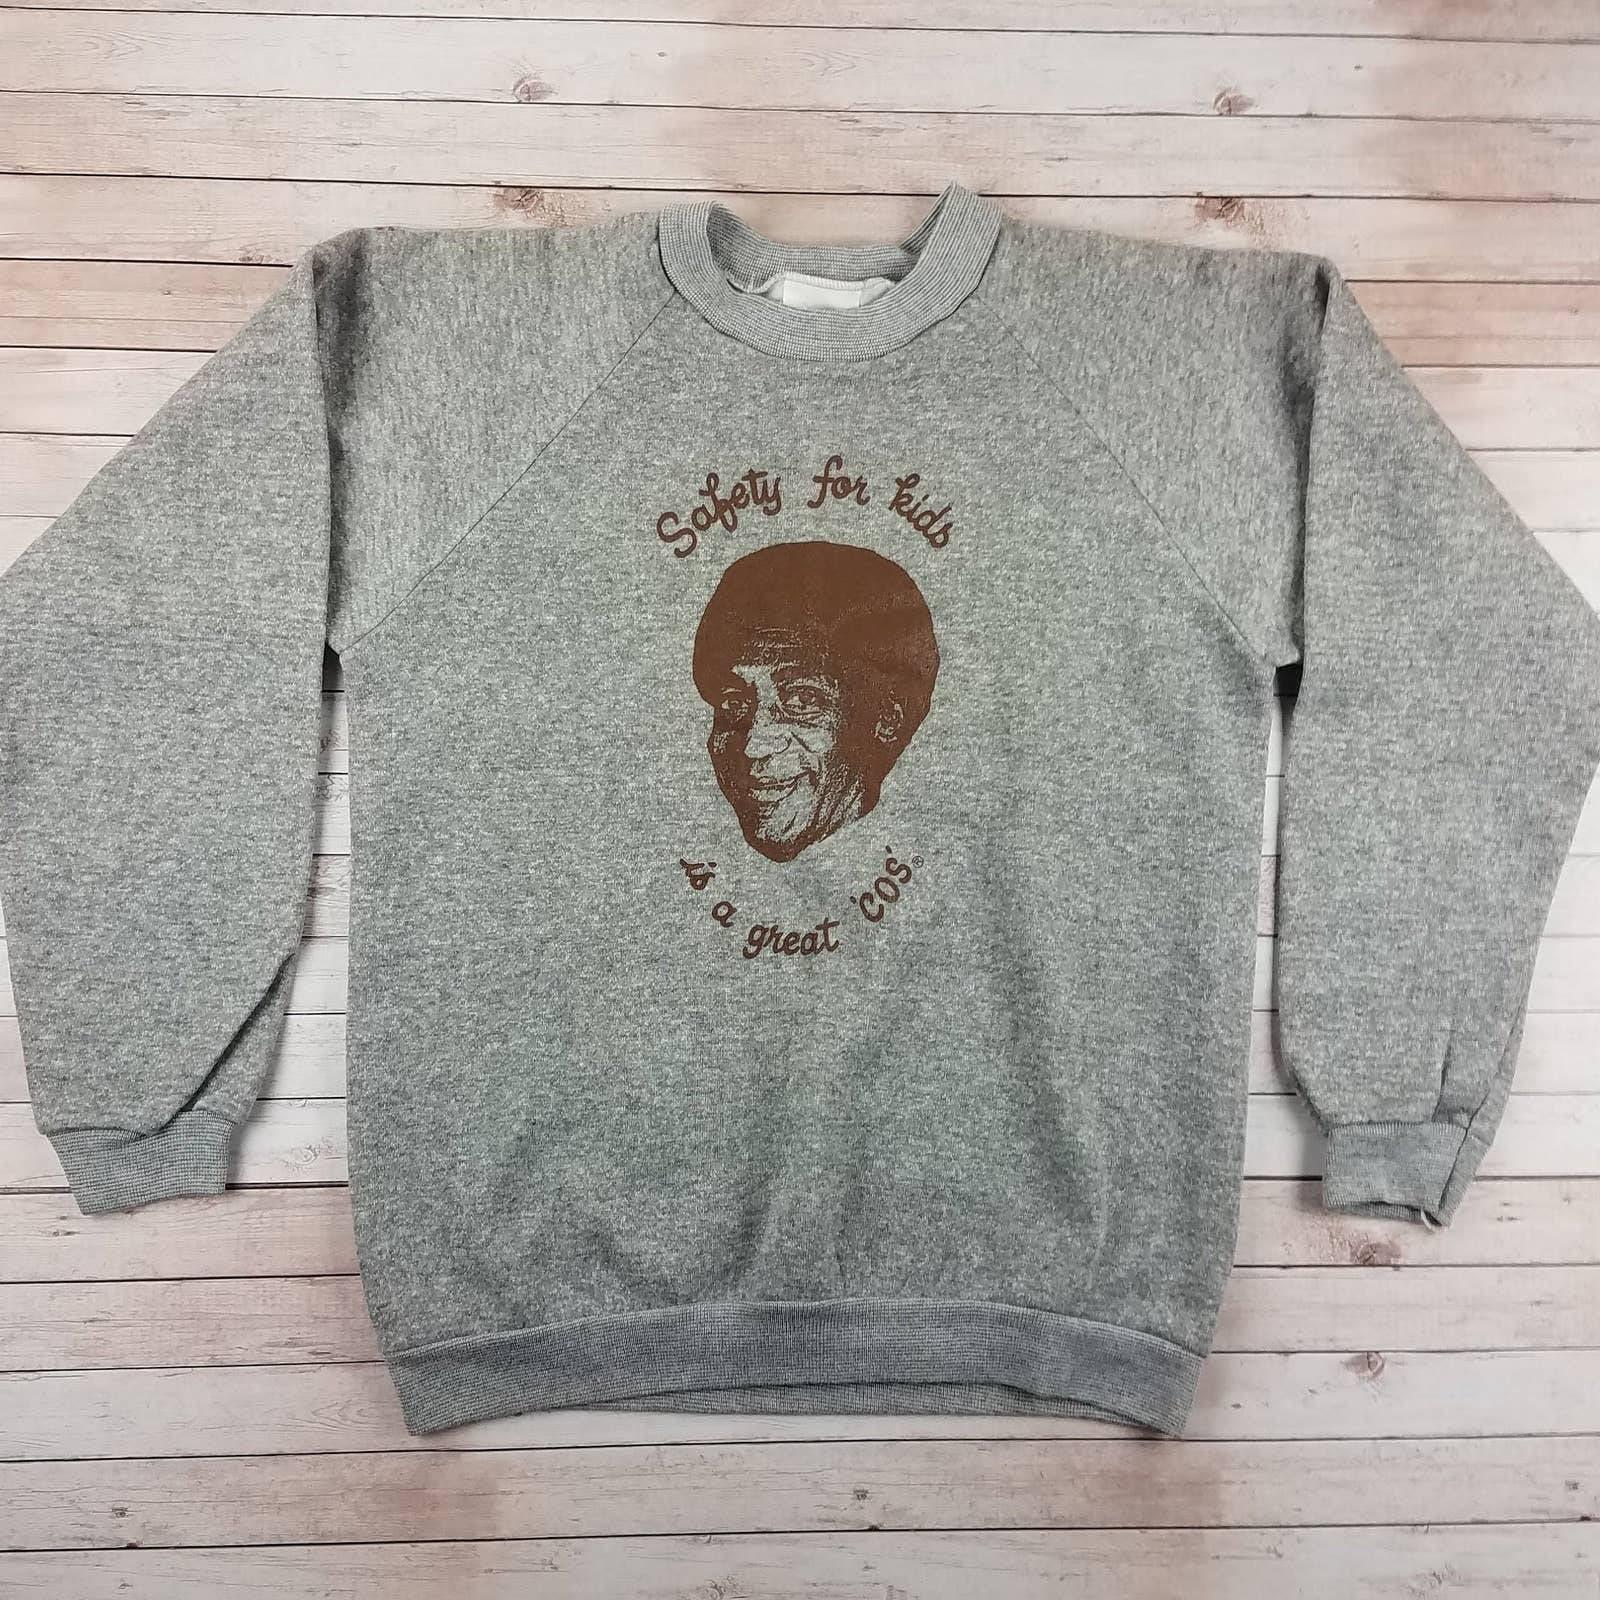 VTG 80s Bill Cosby Healthknit Sweatshirt